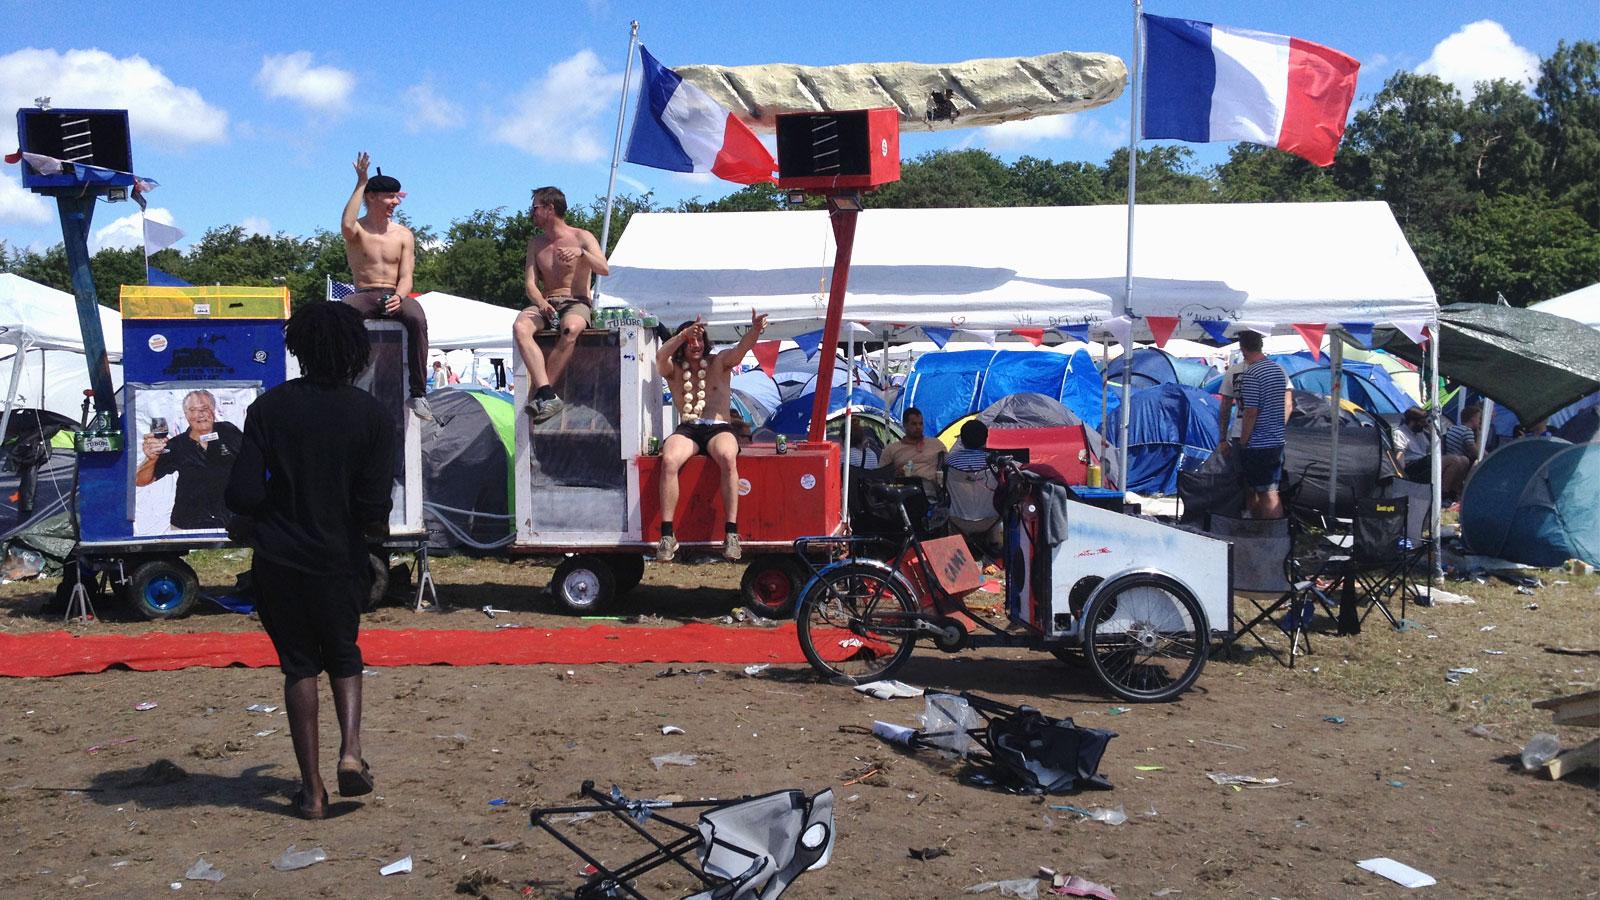 festivalpladsen_0.jpg